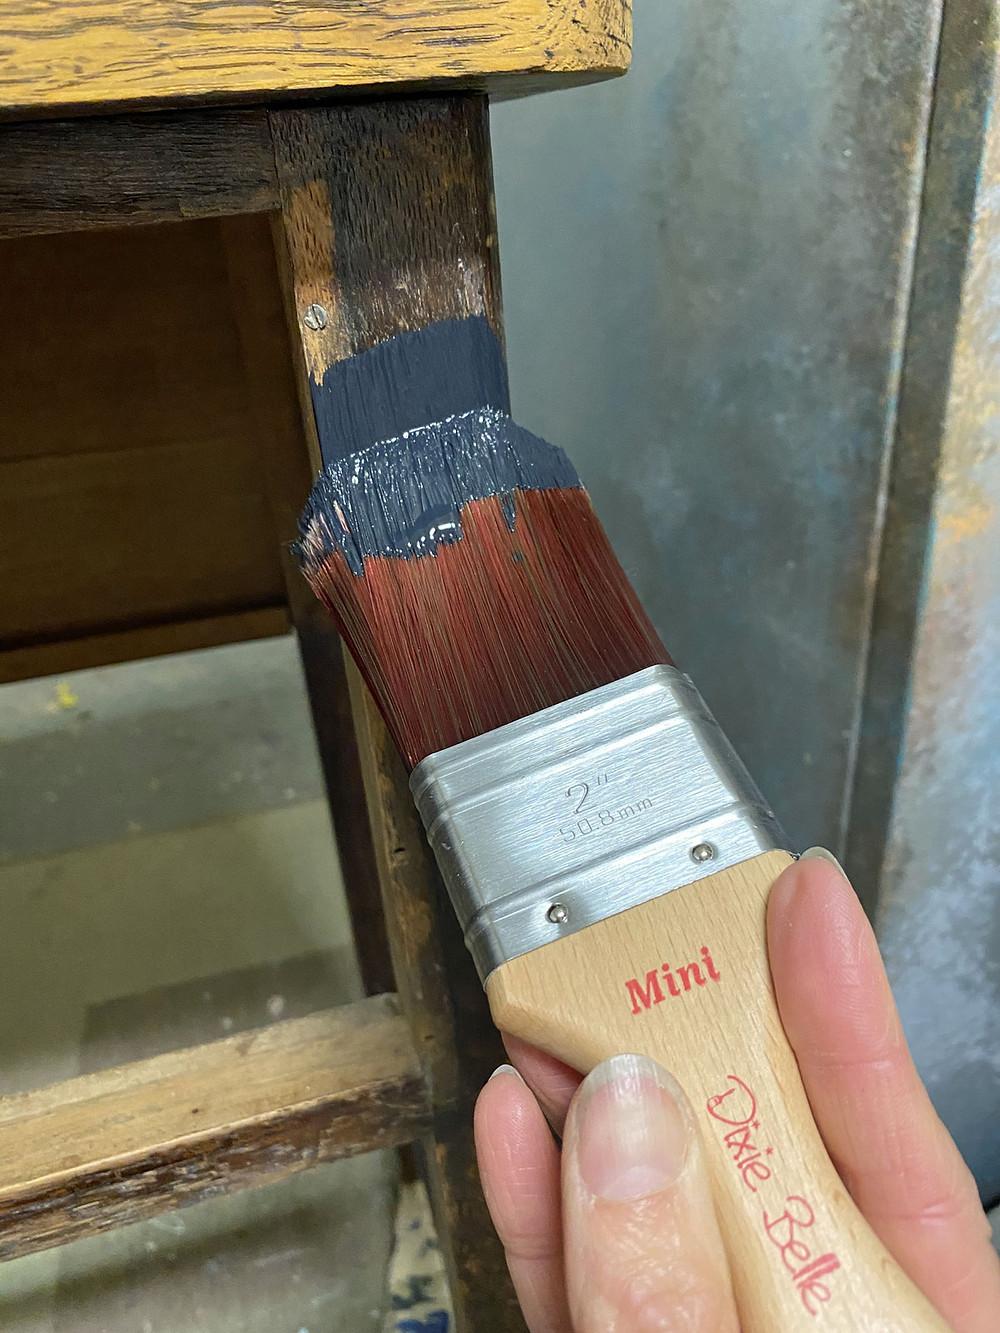 Dixie Belle Paint Kreidefarbe aus Amerika im Test bei gonepaintin